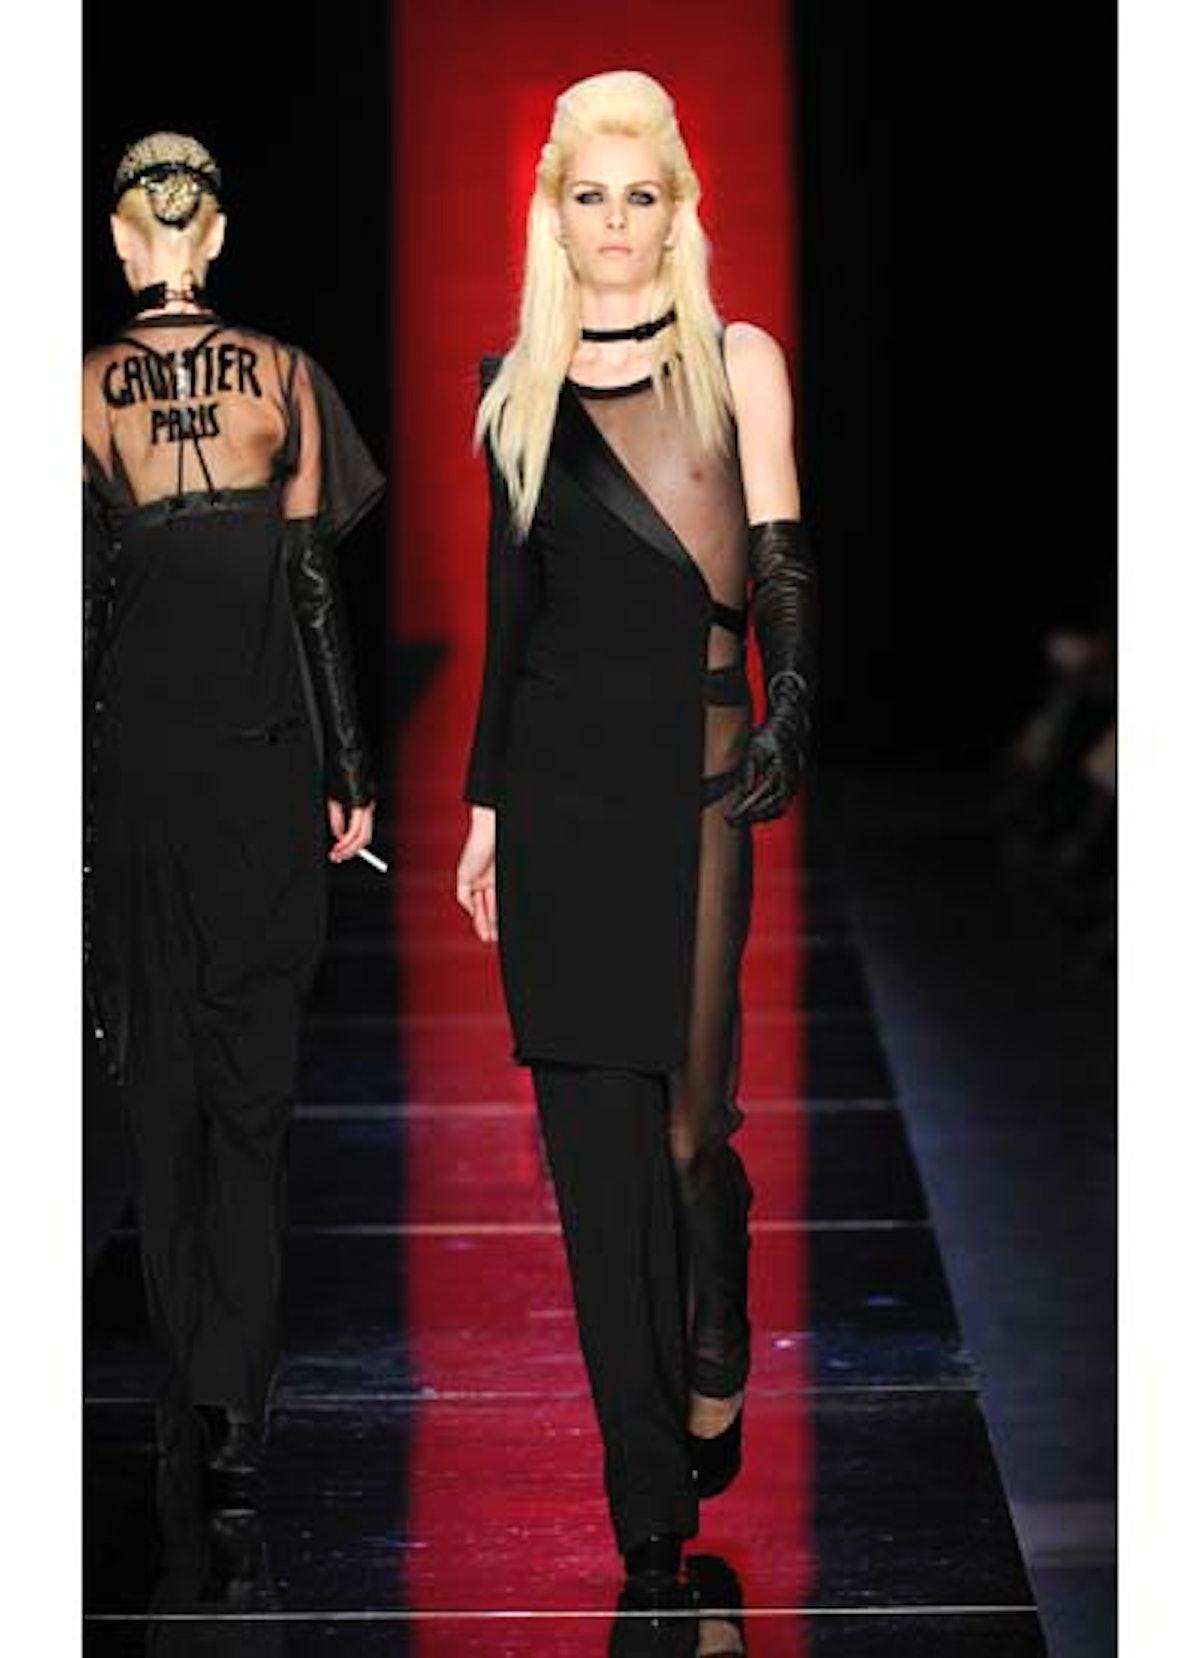 fass-jean-paul-gaultier-couture-2012-runway-13-v.jpg